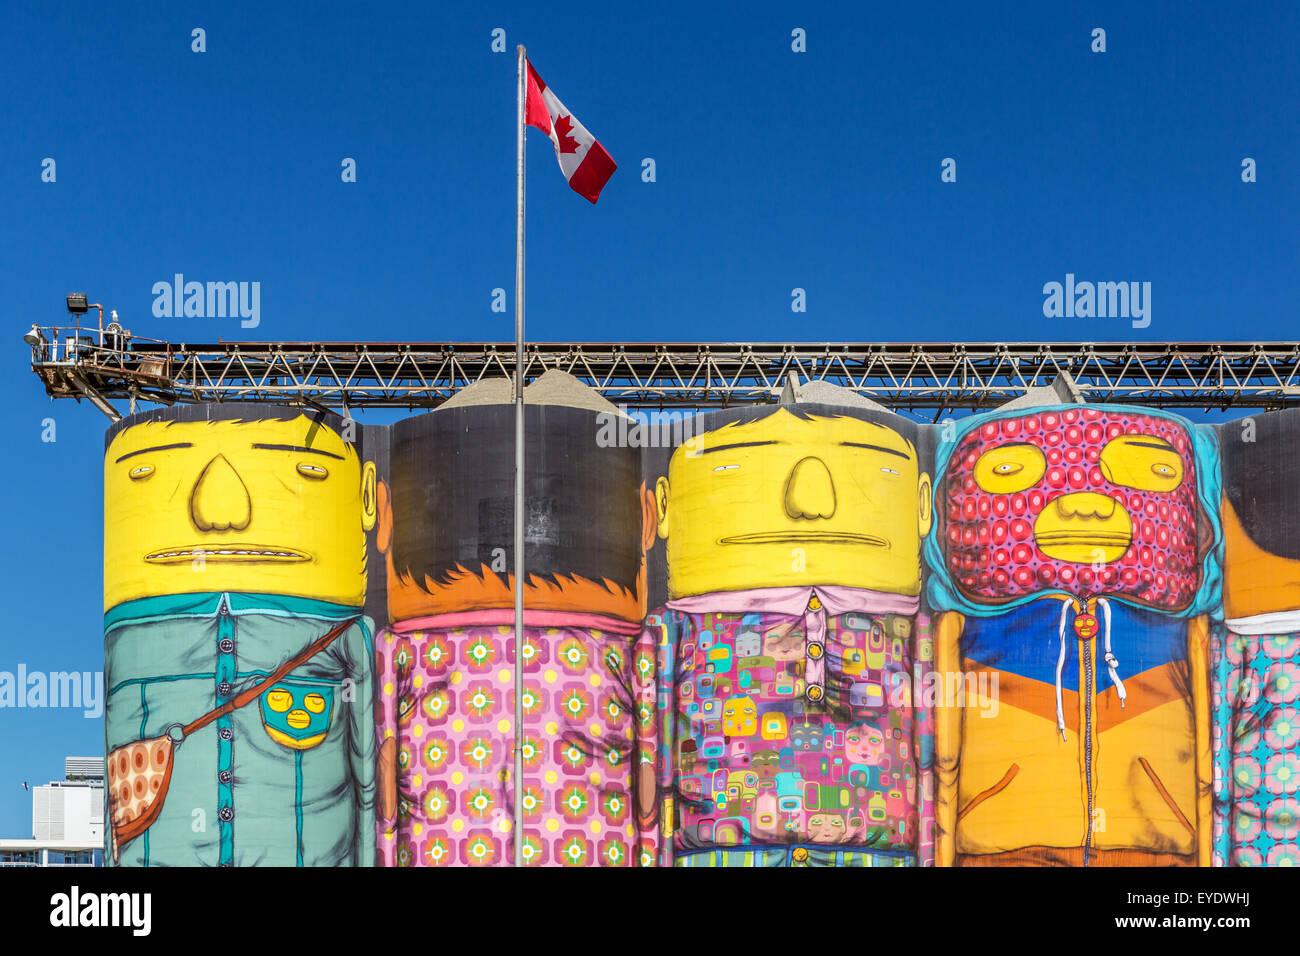 Ocean silos de béton peint par Os Gemeos, Granville Island, Vancouver, British Columbia, Canada Photo Stock